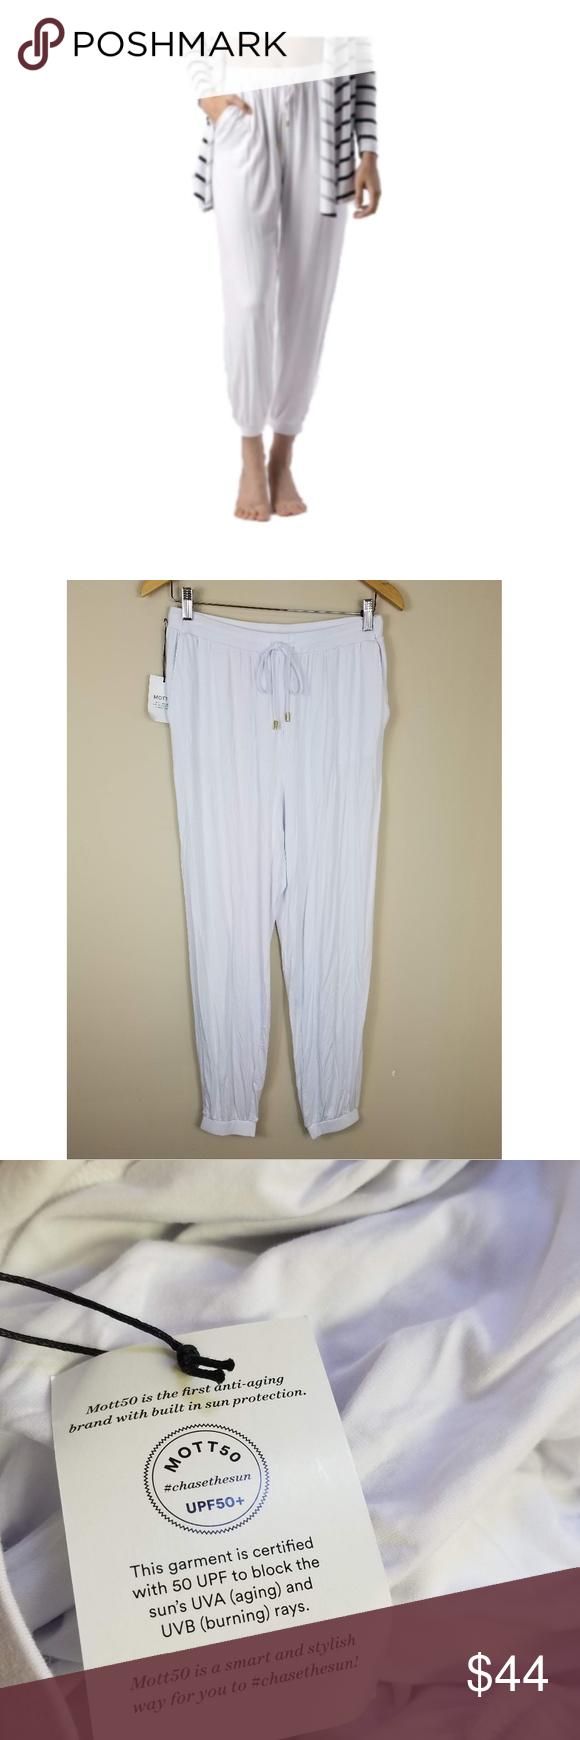 Mott50 Womens Mimi Athletic Pants